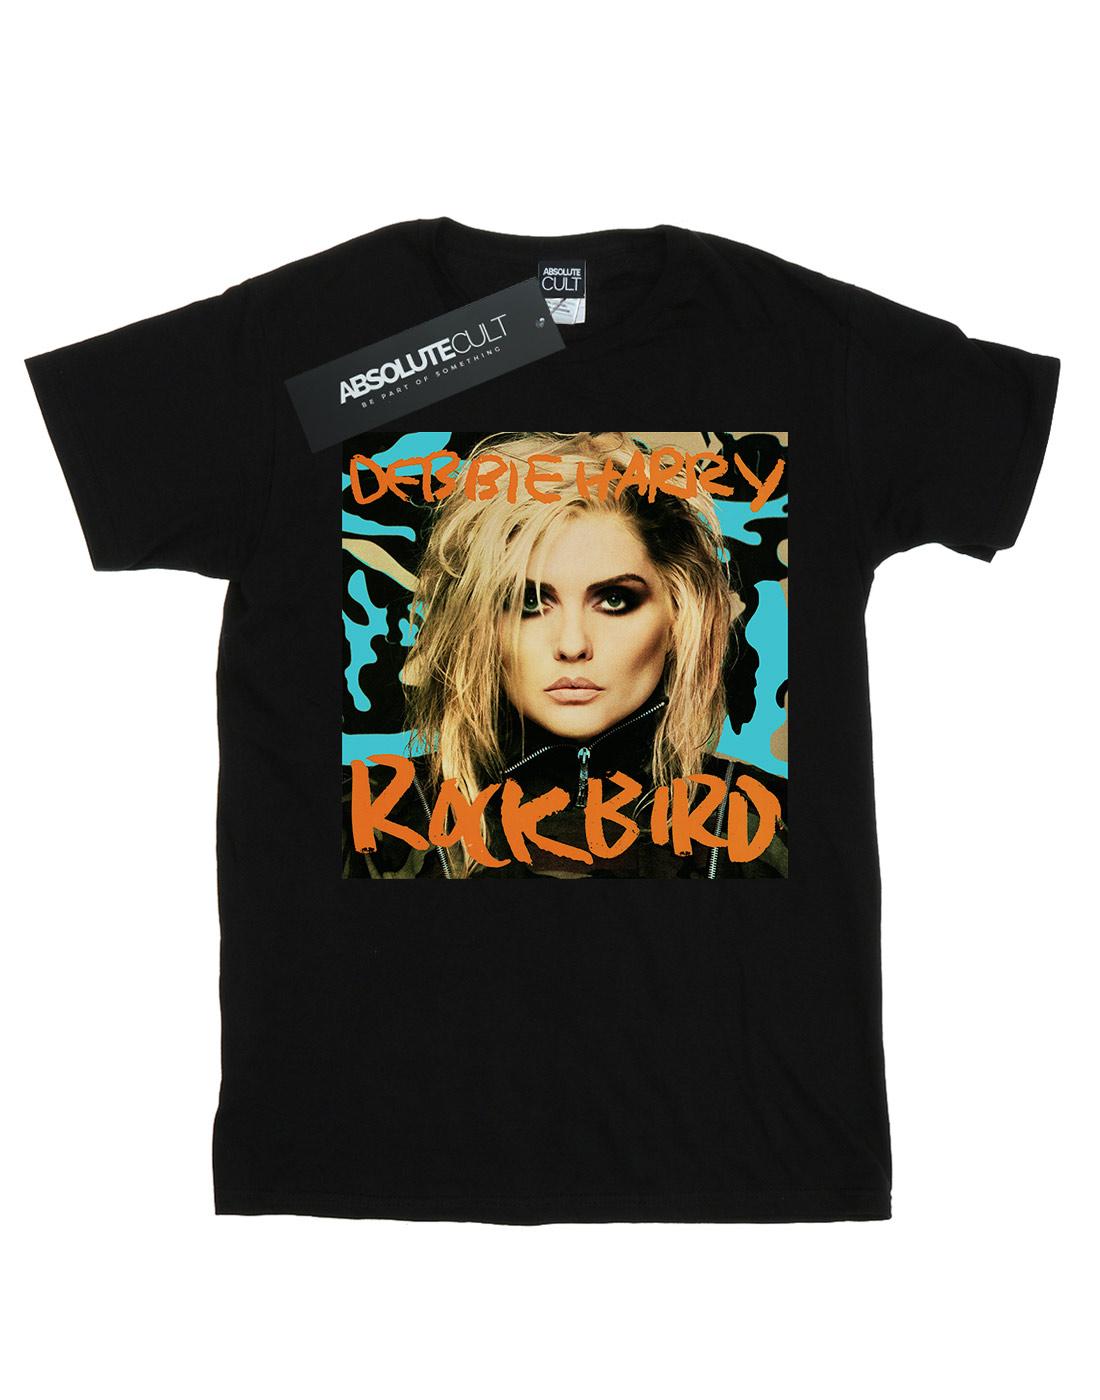 Debbie-Harry-Ninas-Rockbird-Cover-Camiseta